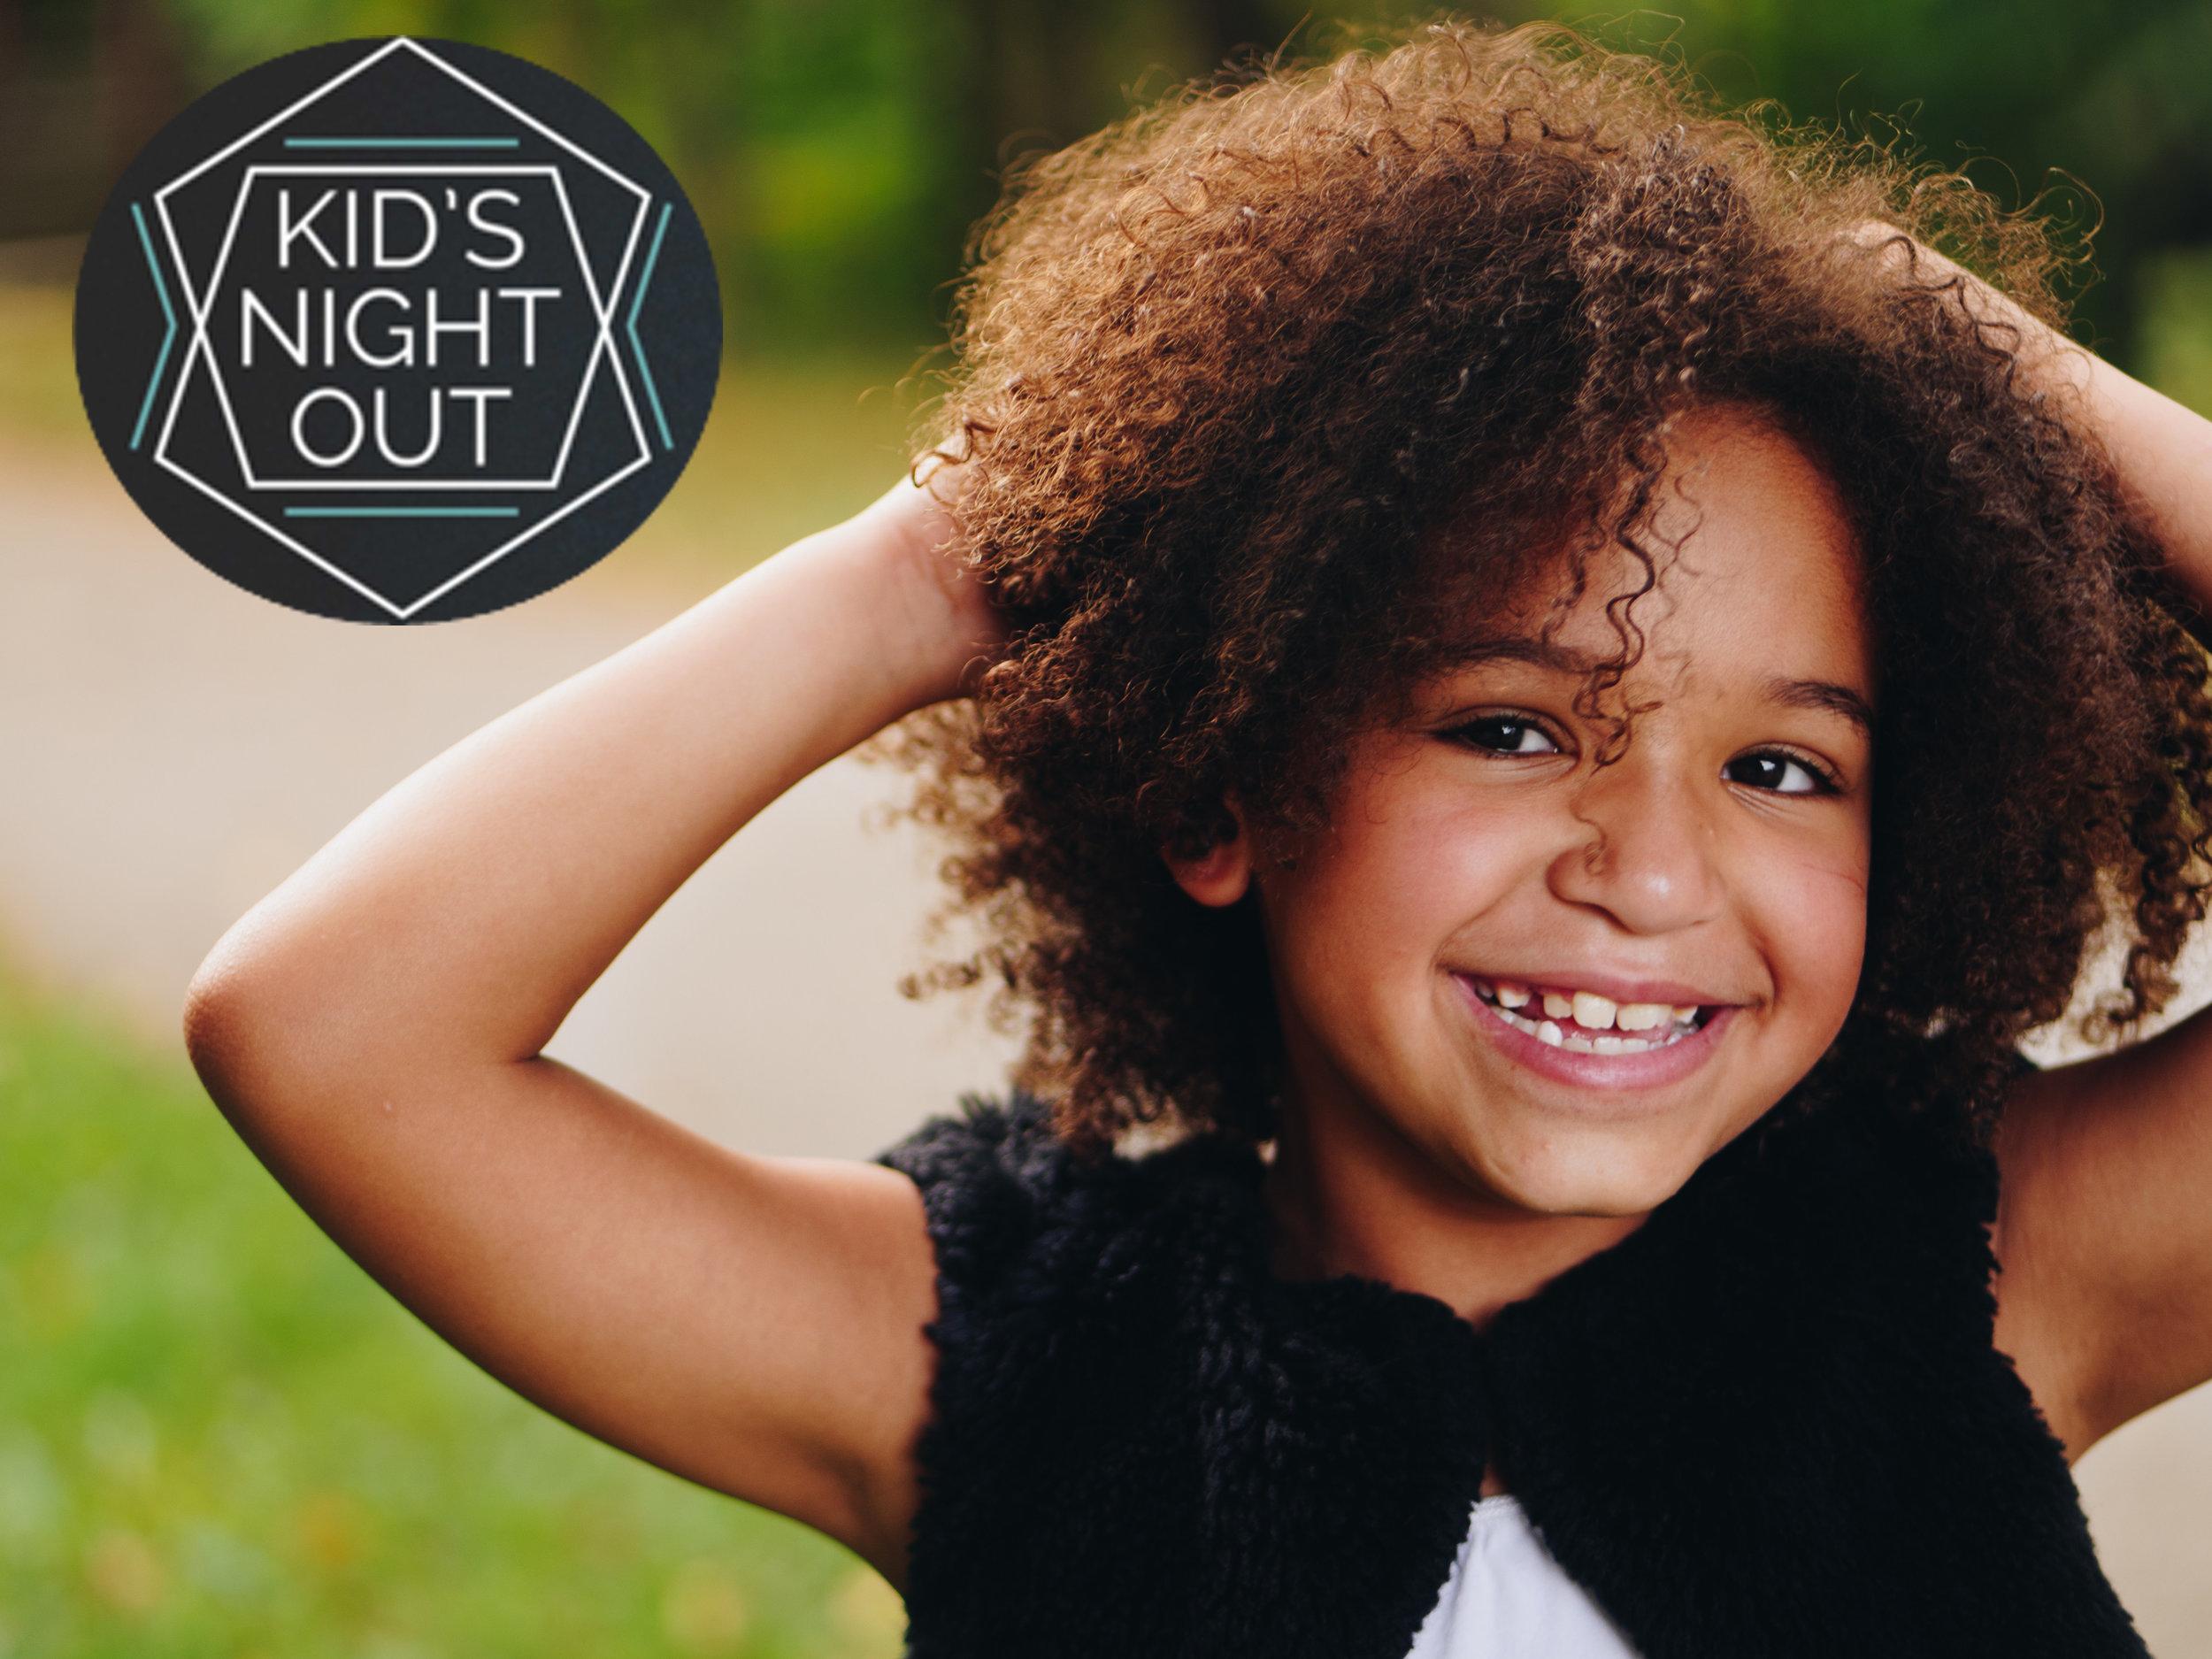 kidsnight outweb.jpg